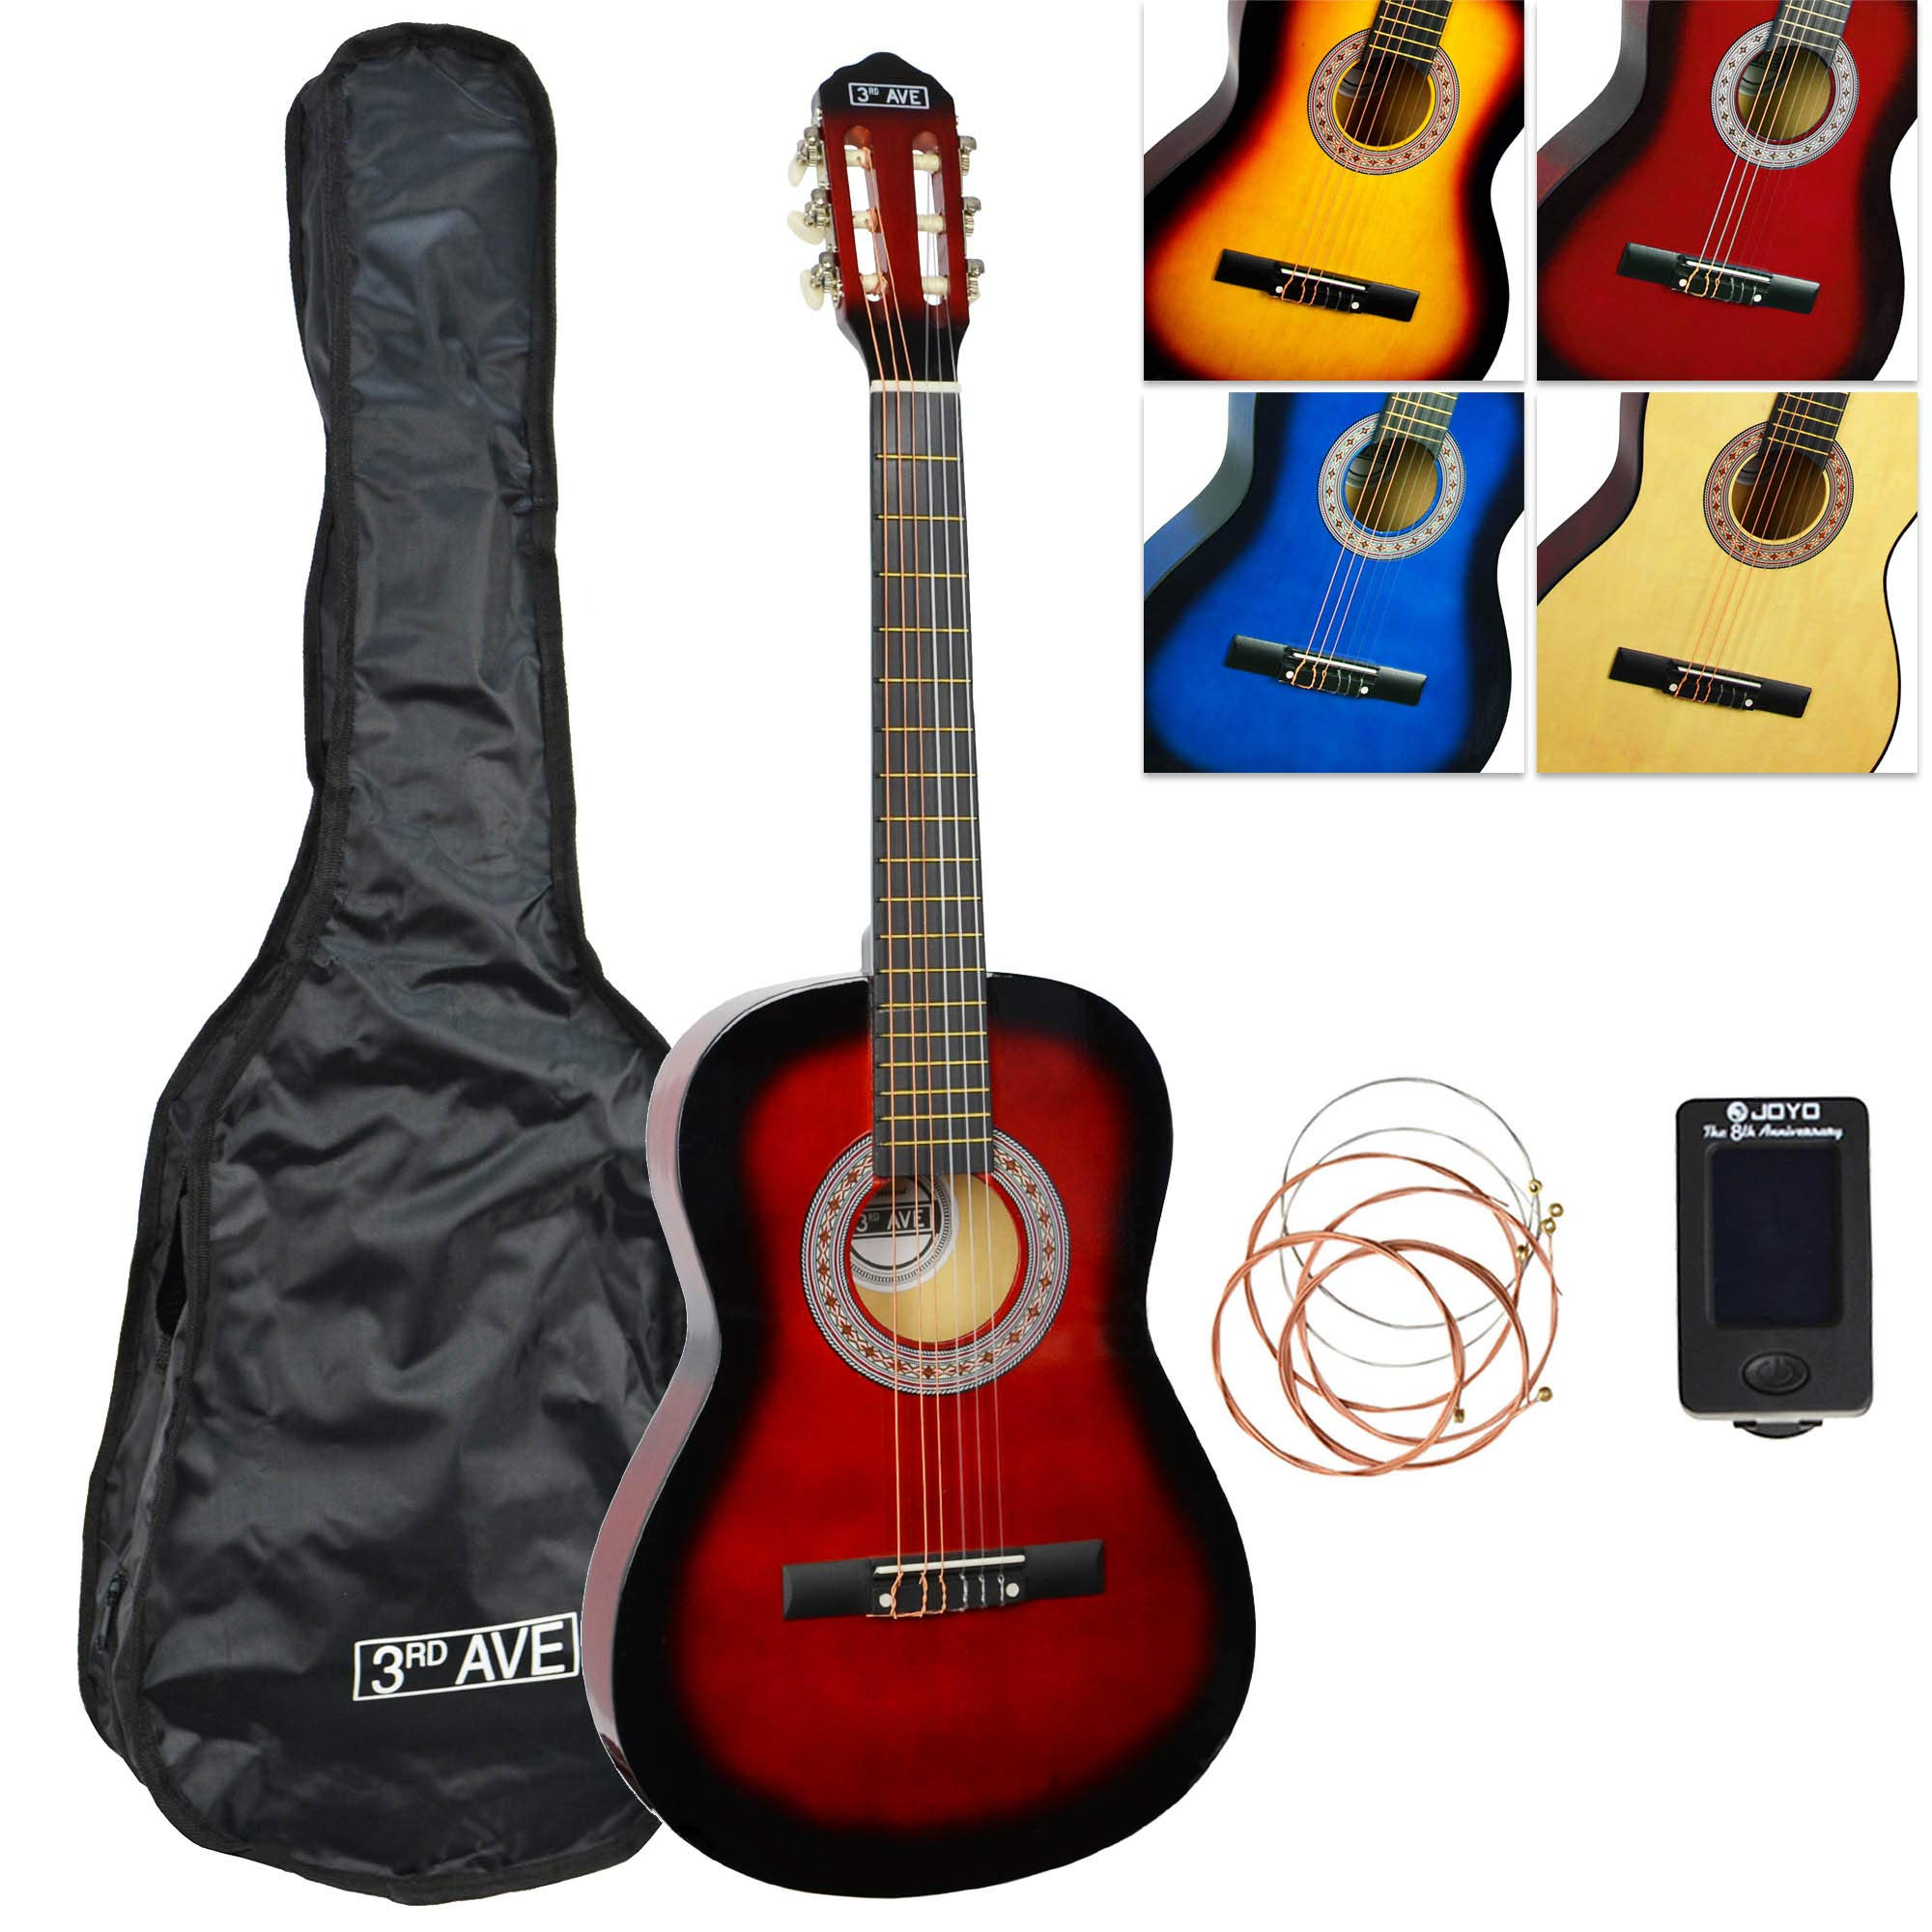 3rd Avenue 3/4 Size Classical Guitar Pack - Redburst